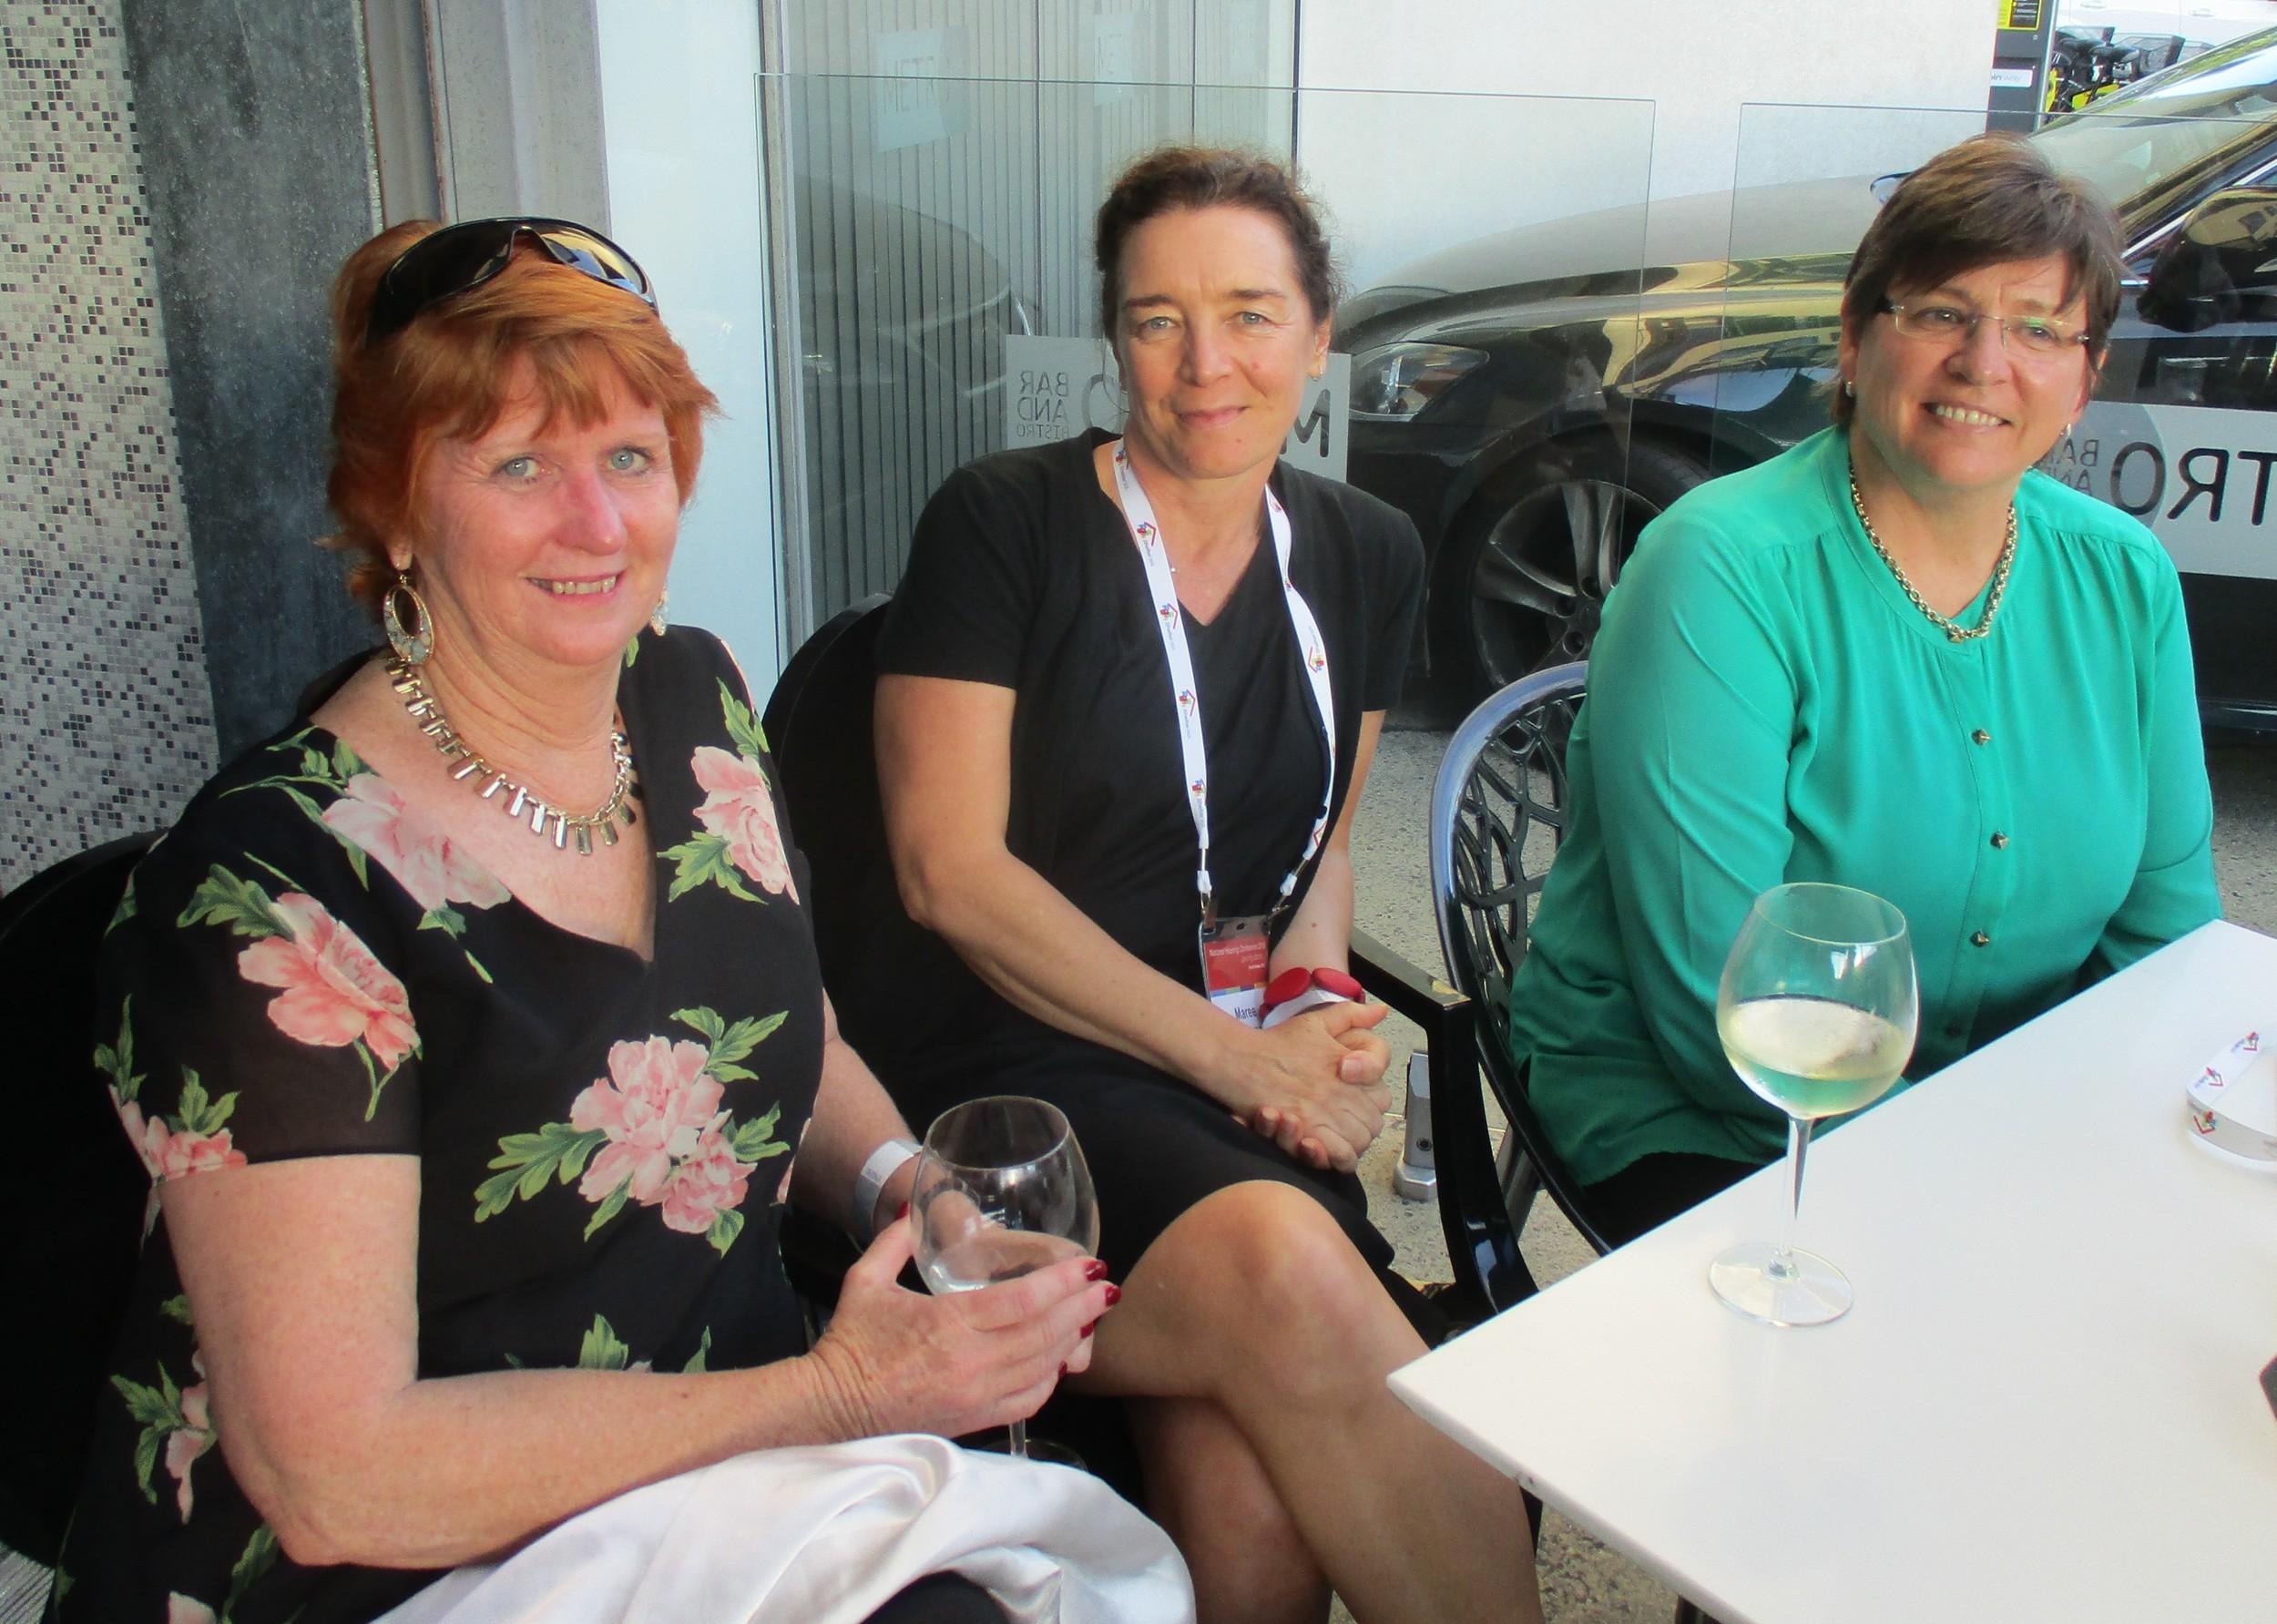 2015-10-29  Perth conference 03.JPG